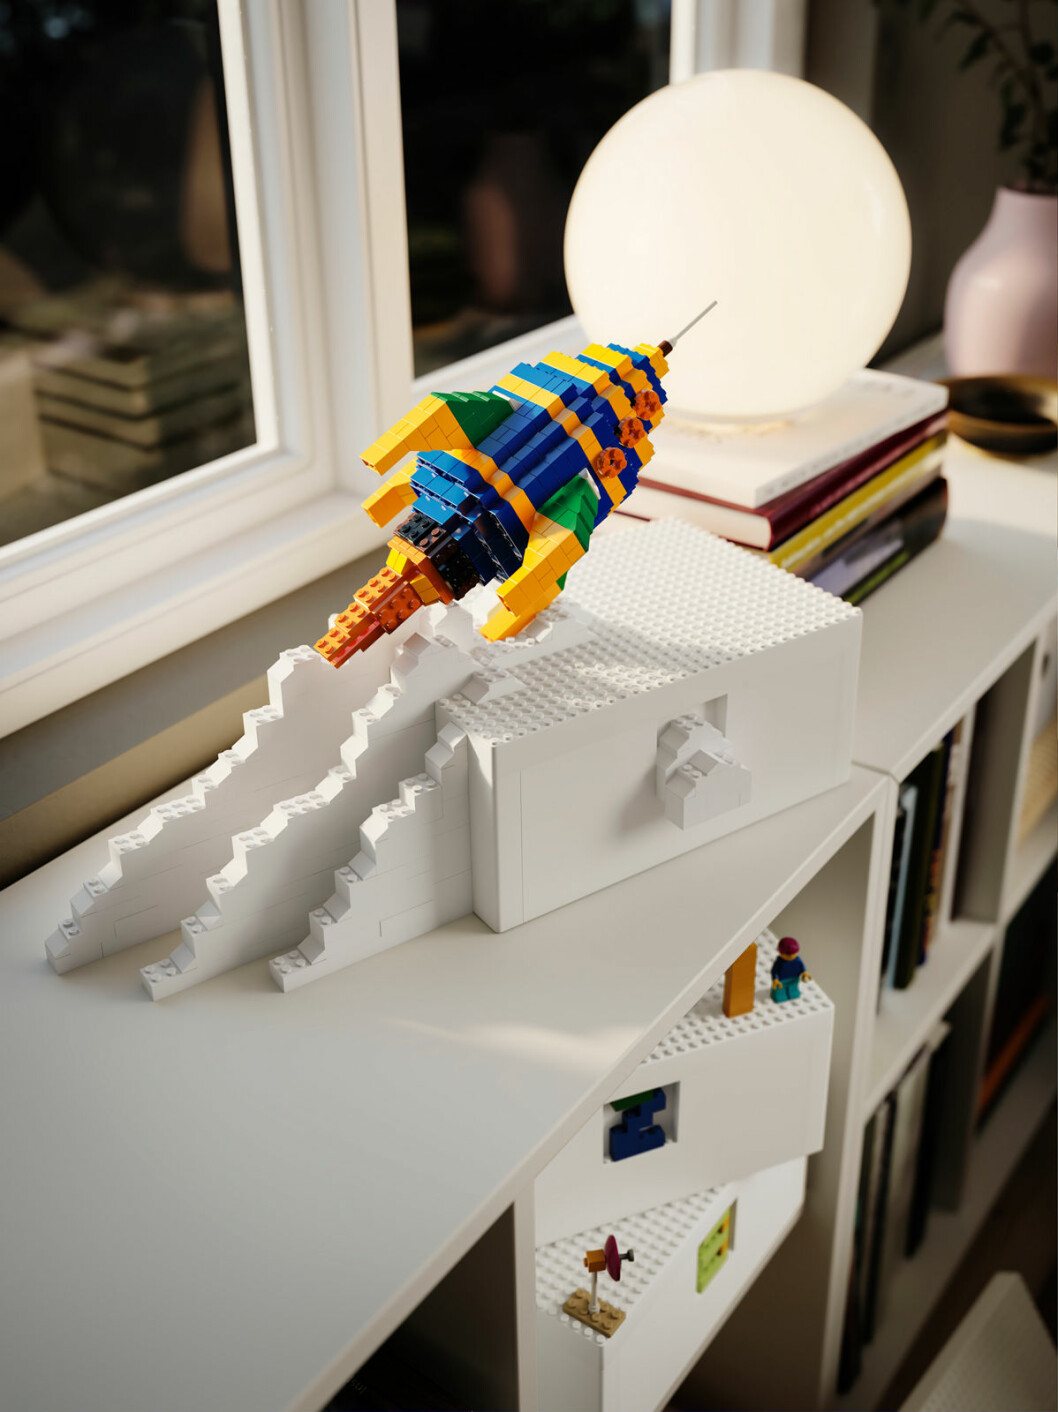 Ikea Lego samarbete bygglek klossar hylla